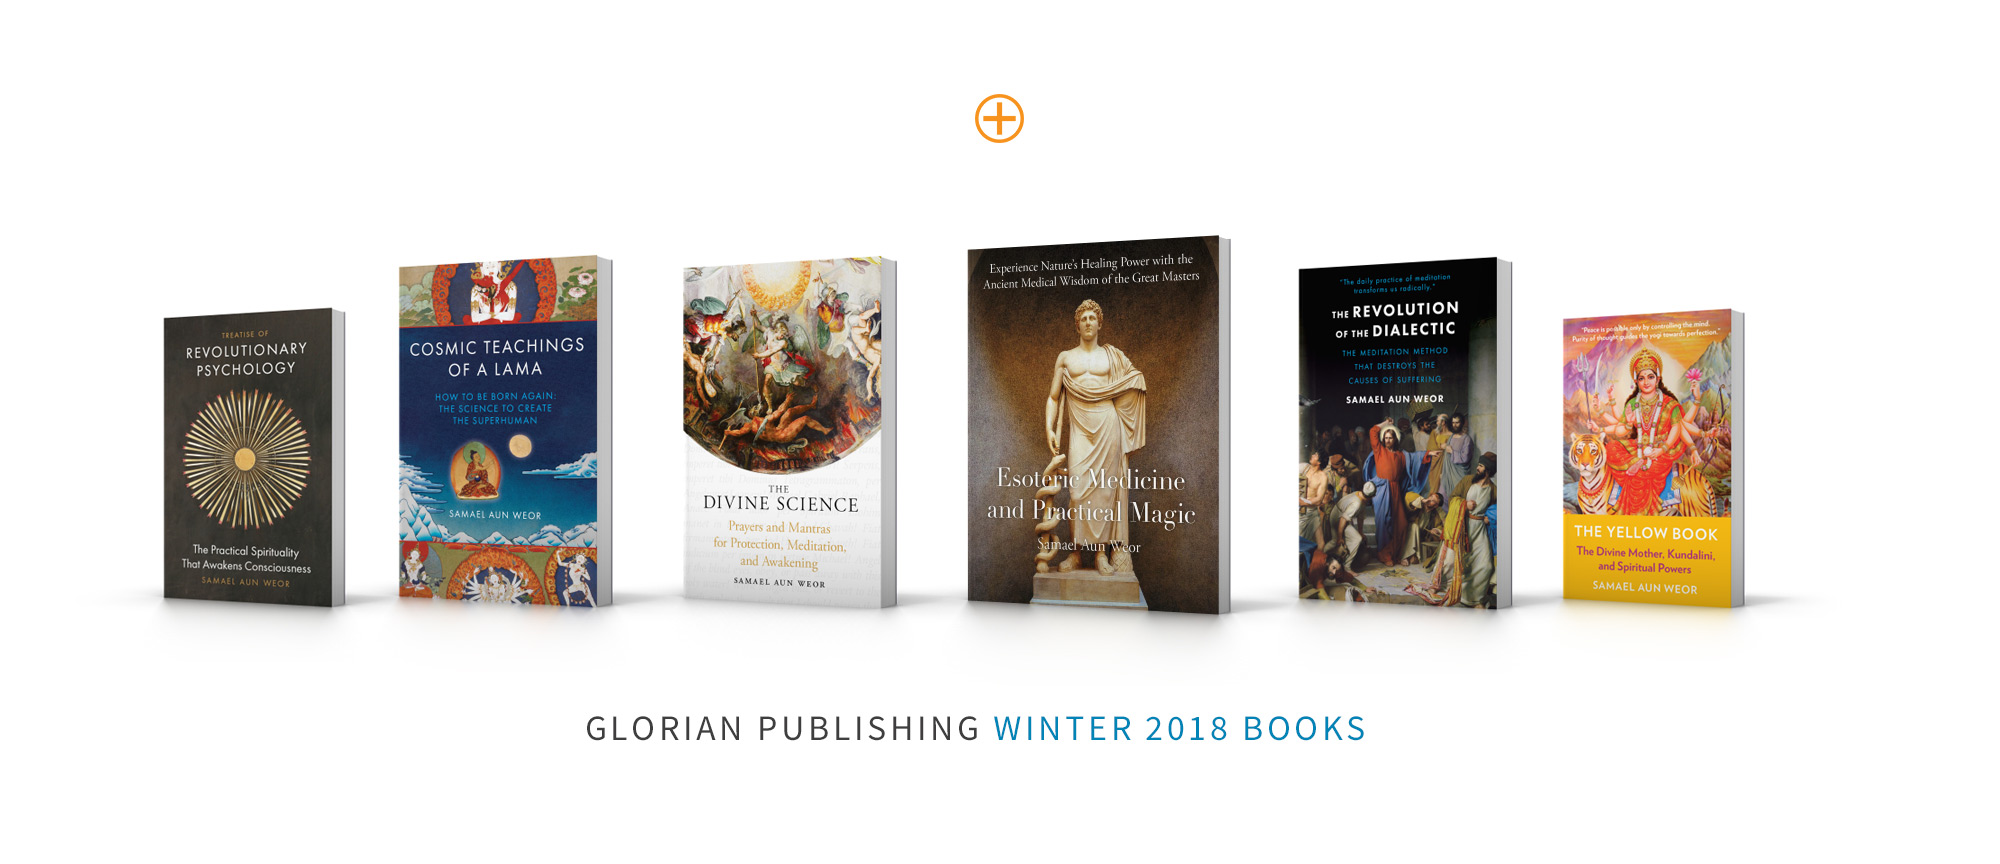 glorian-publishing-winter-2018-books